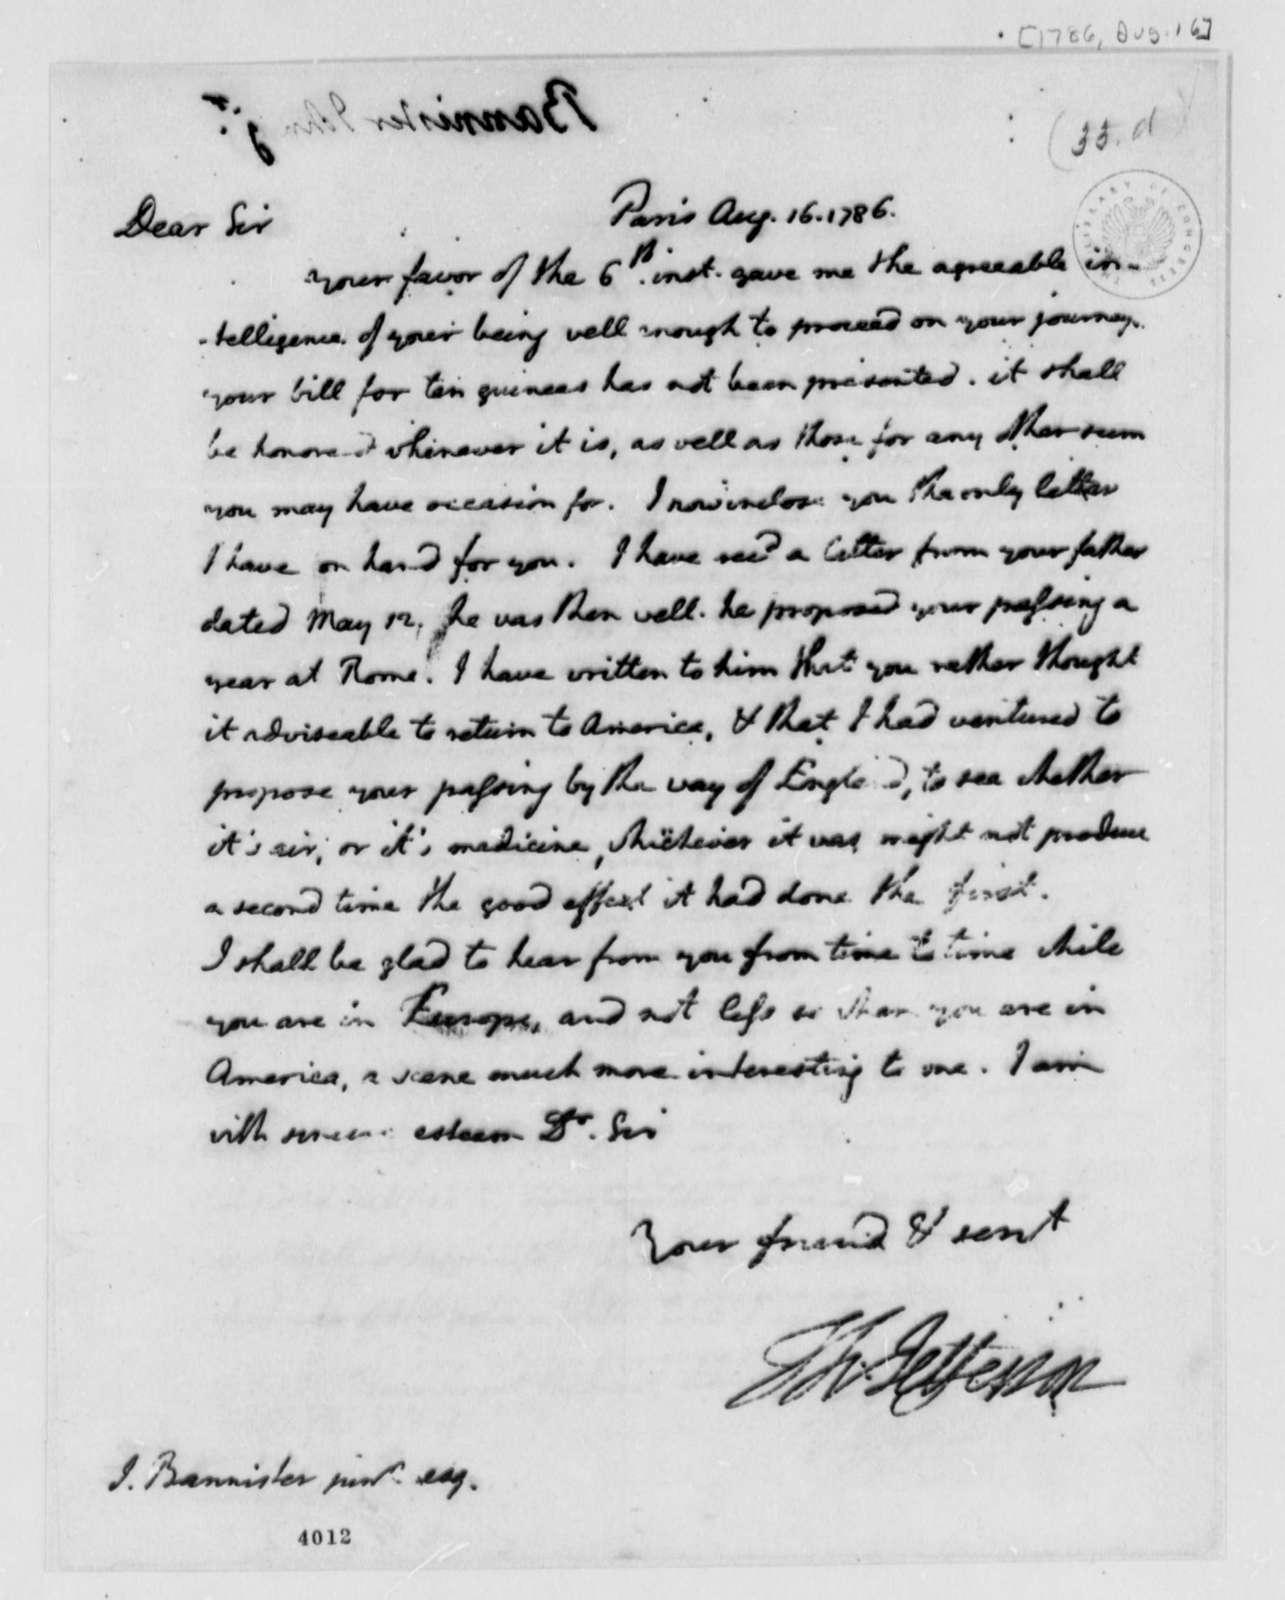 Thomas Jefferson to John Banister Jr., August 16, 1786